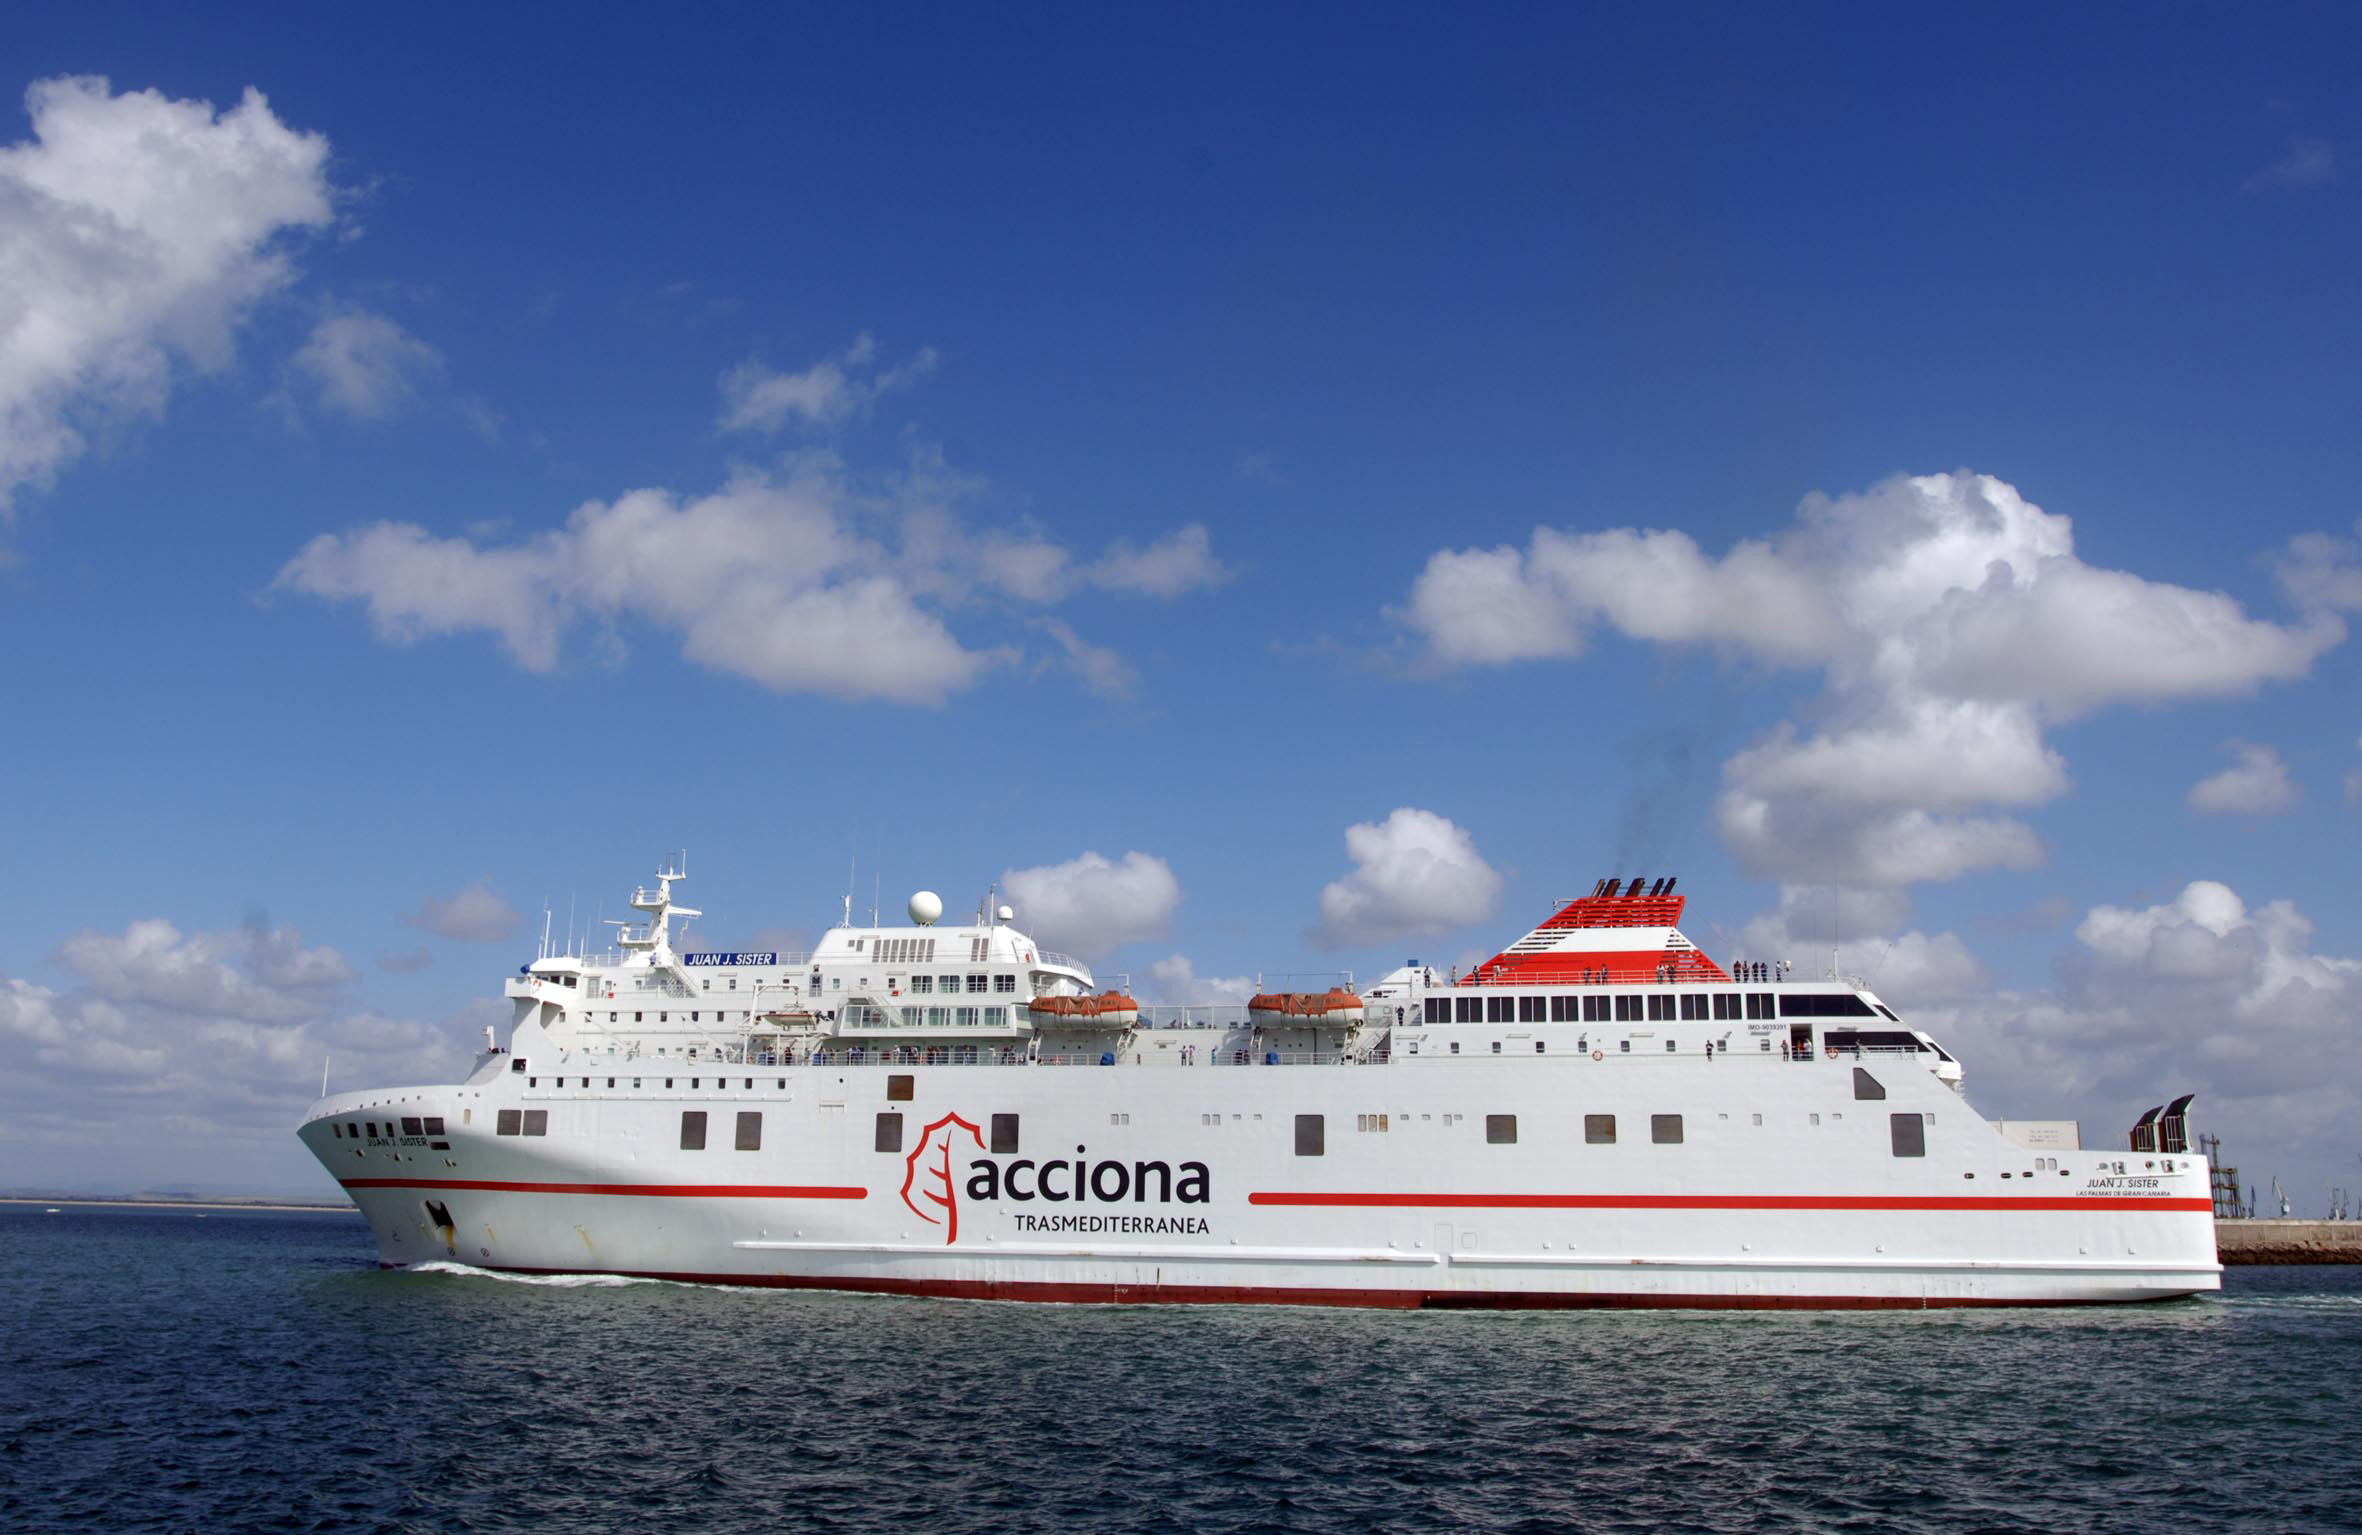 almeria ghazaouet ferry 2016